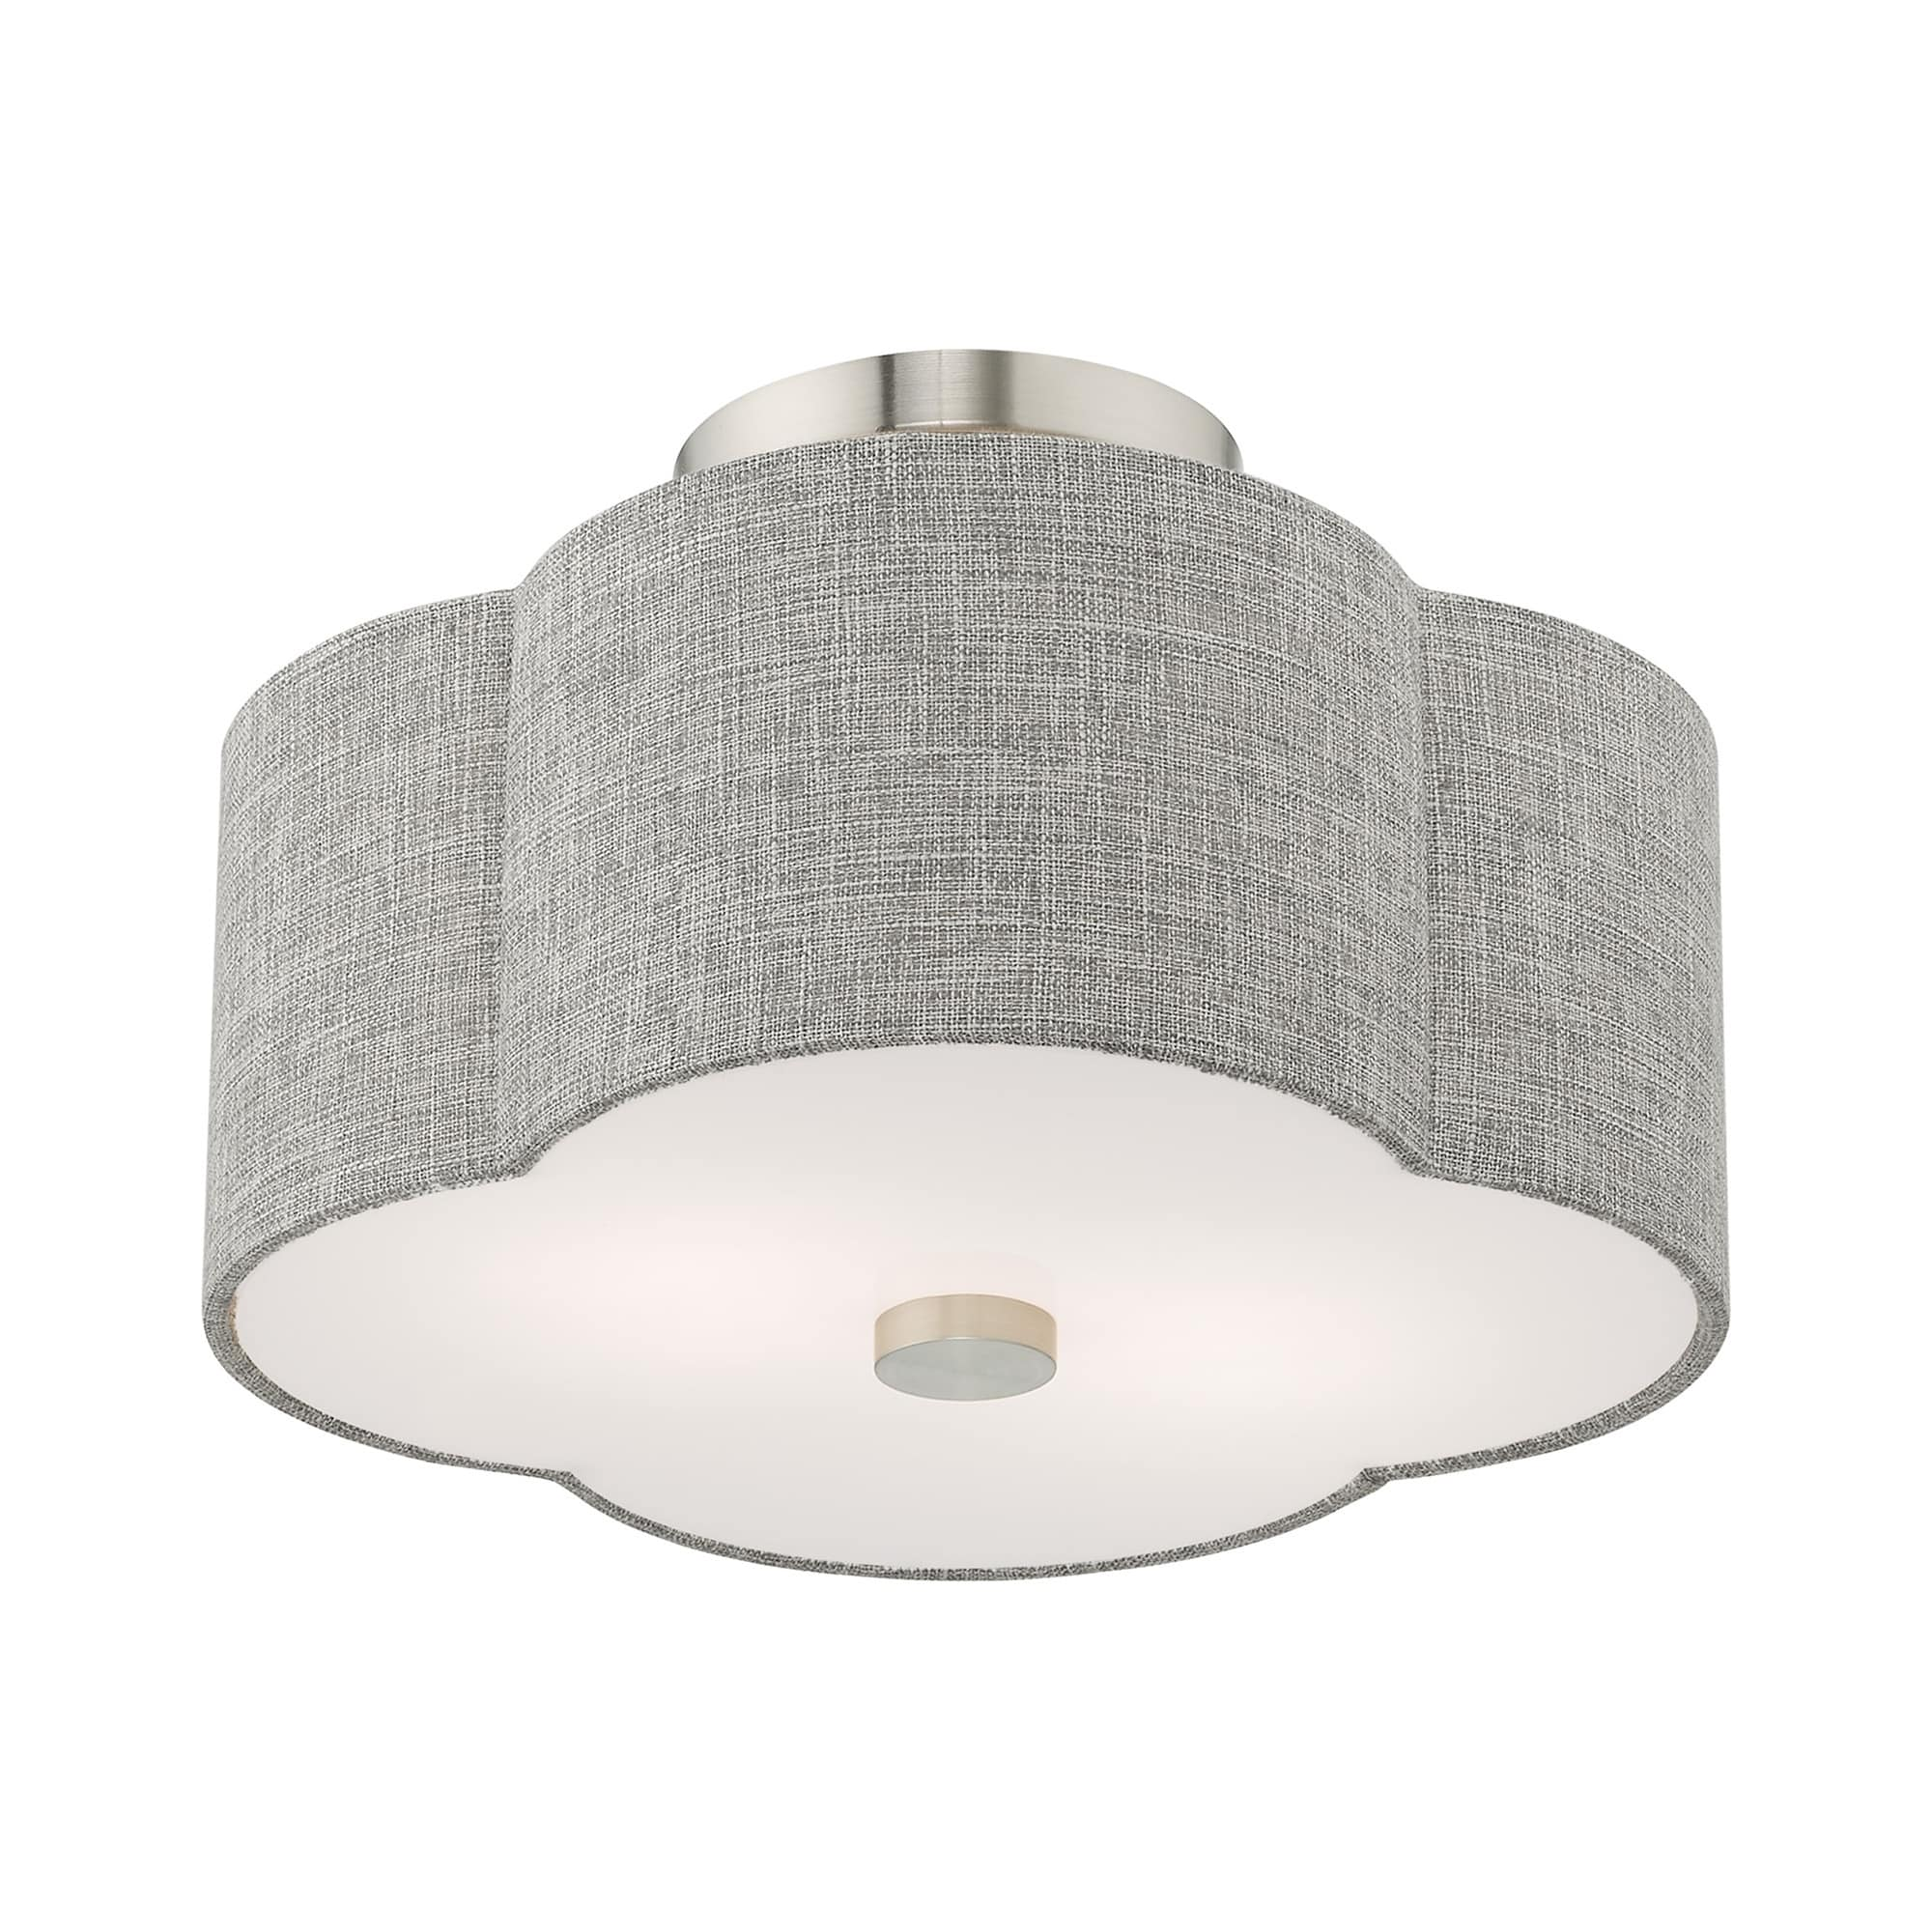 Livex Lighting Kalmar 2 Light Brushed Nickel Ceiling Mount 13 Dia X 8 5 H